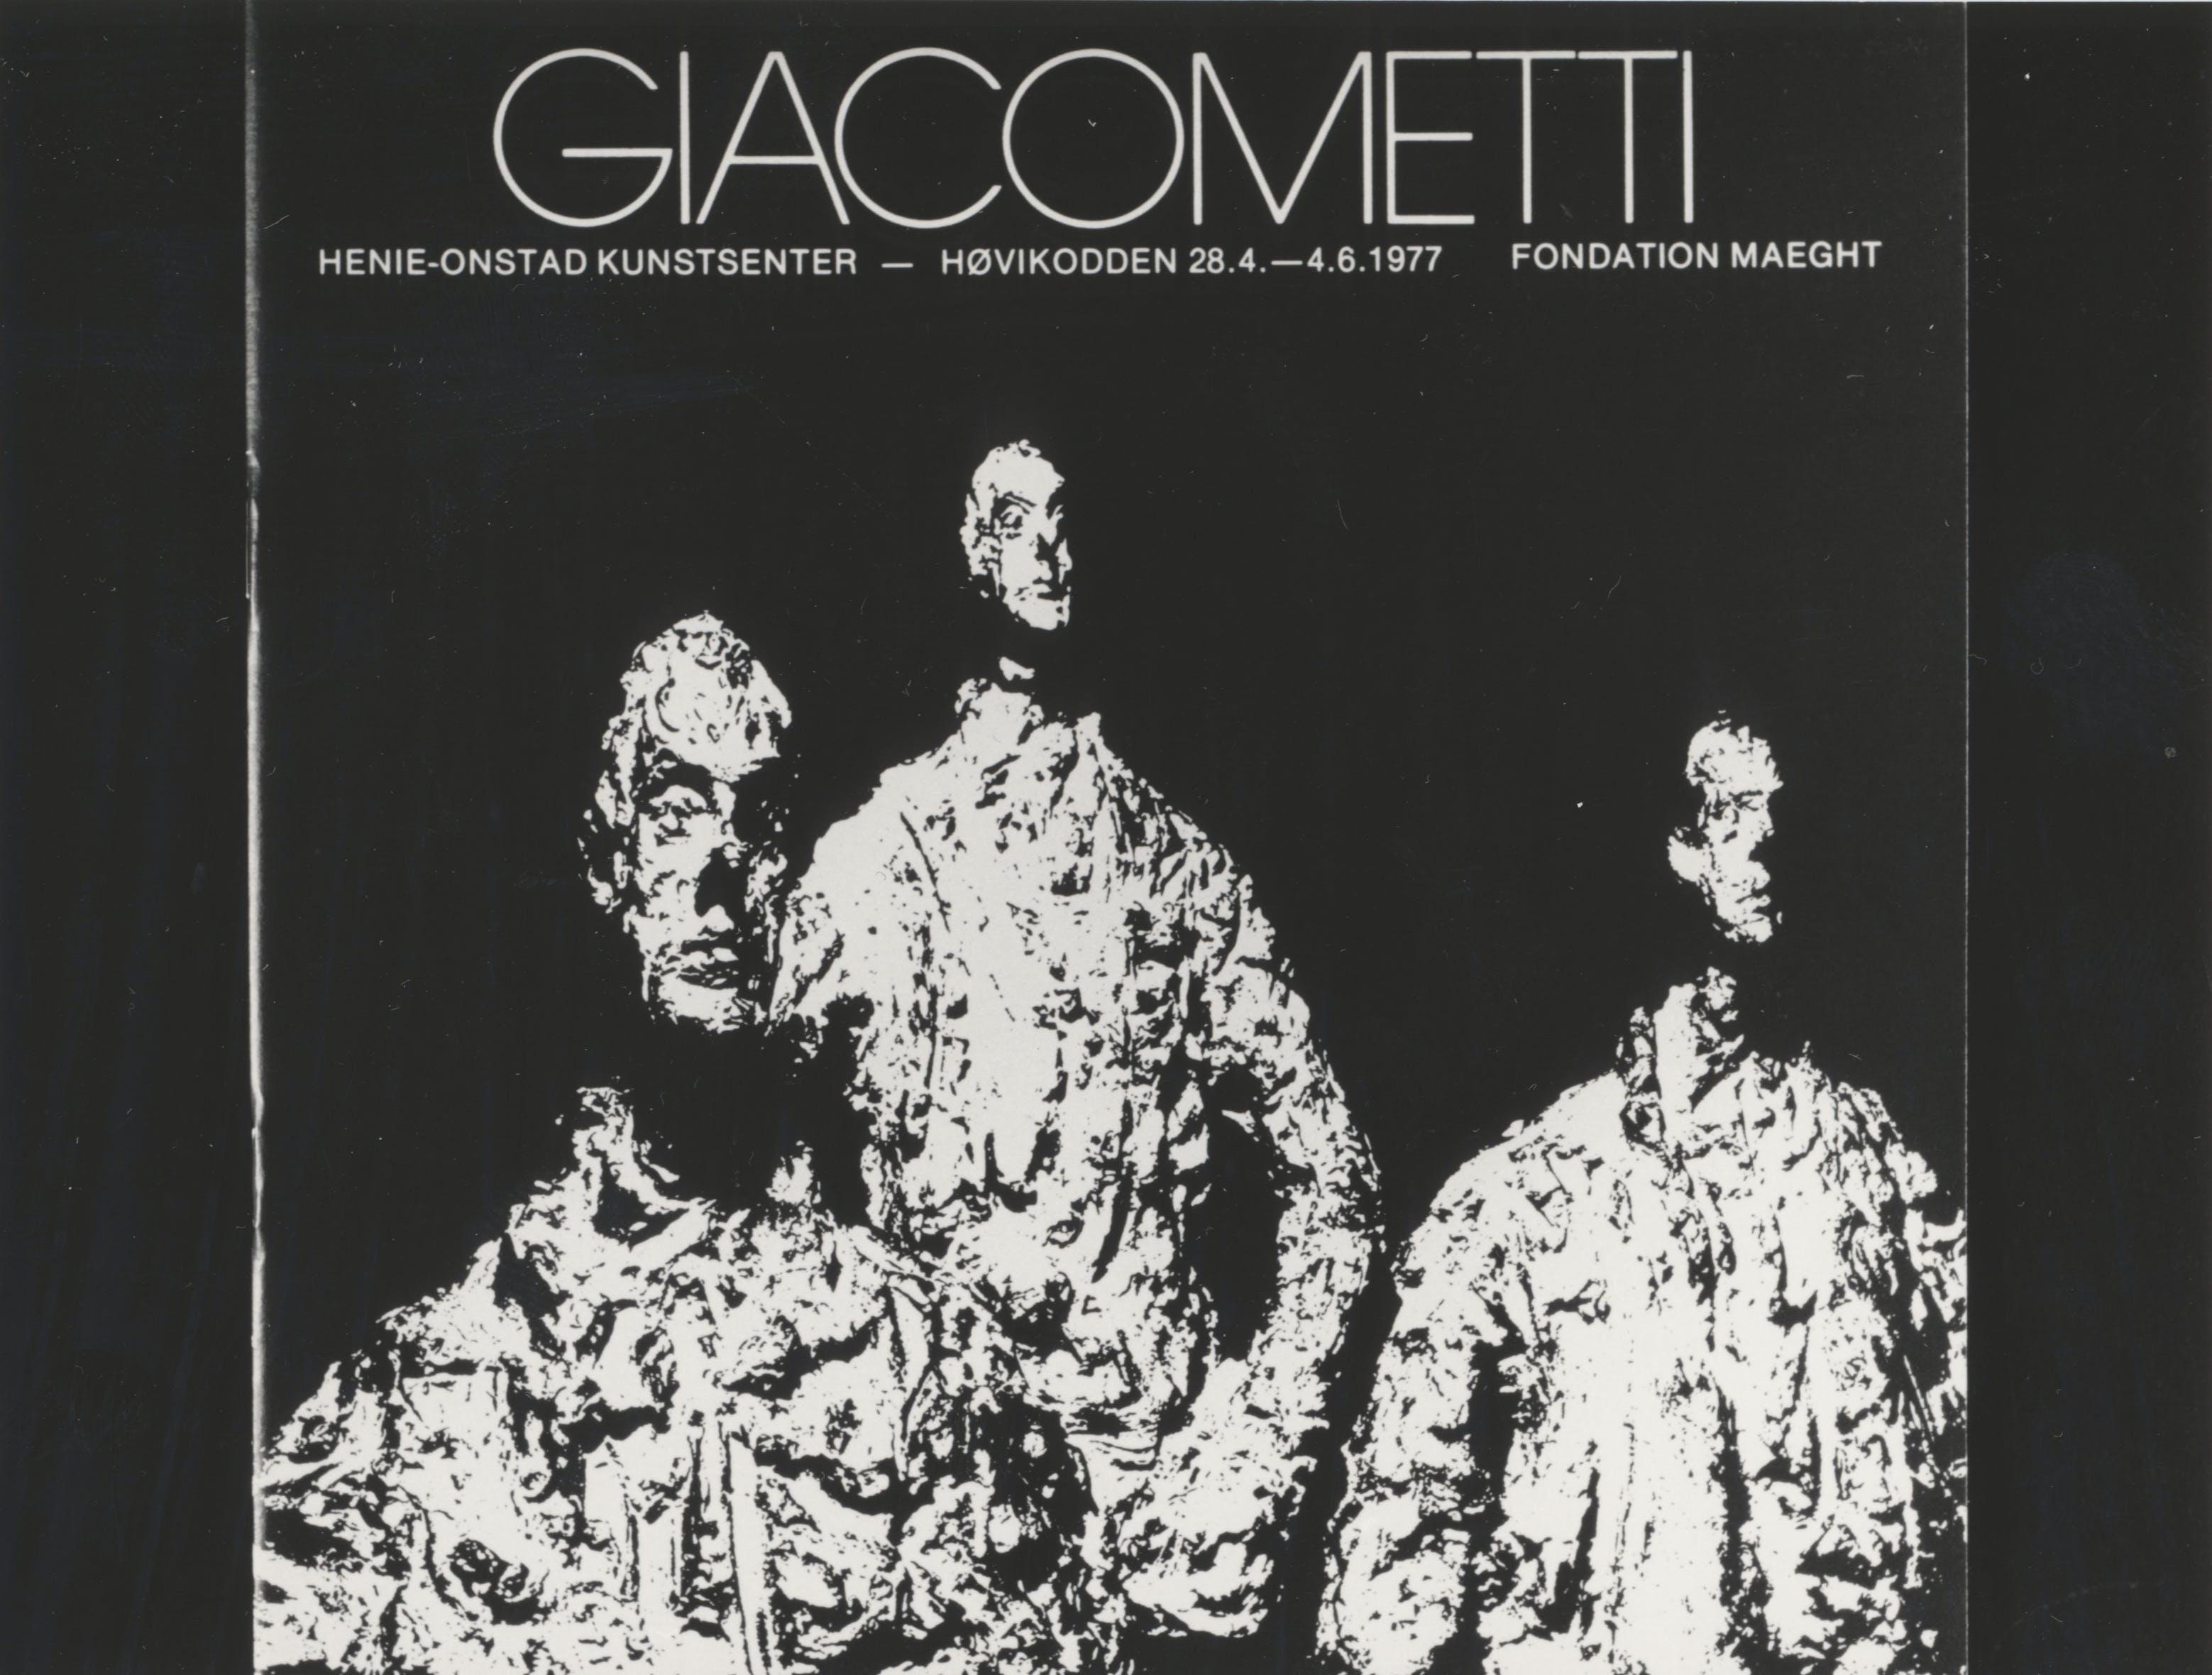 Giacometti006